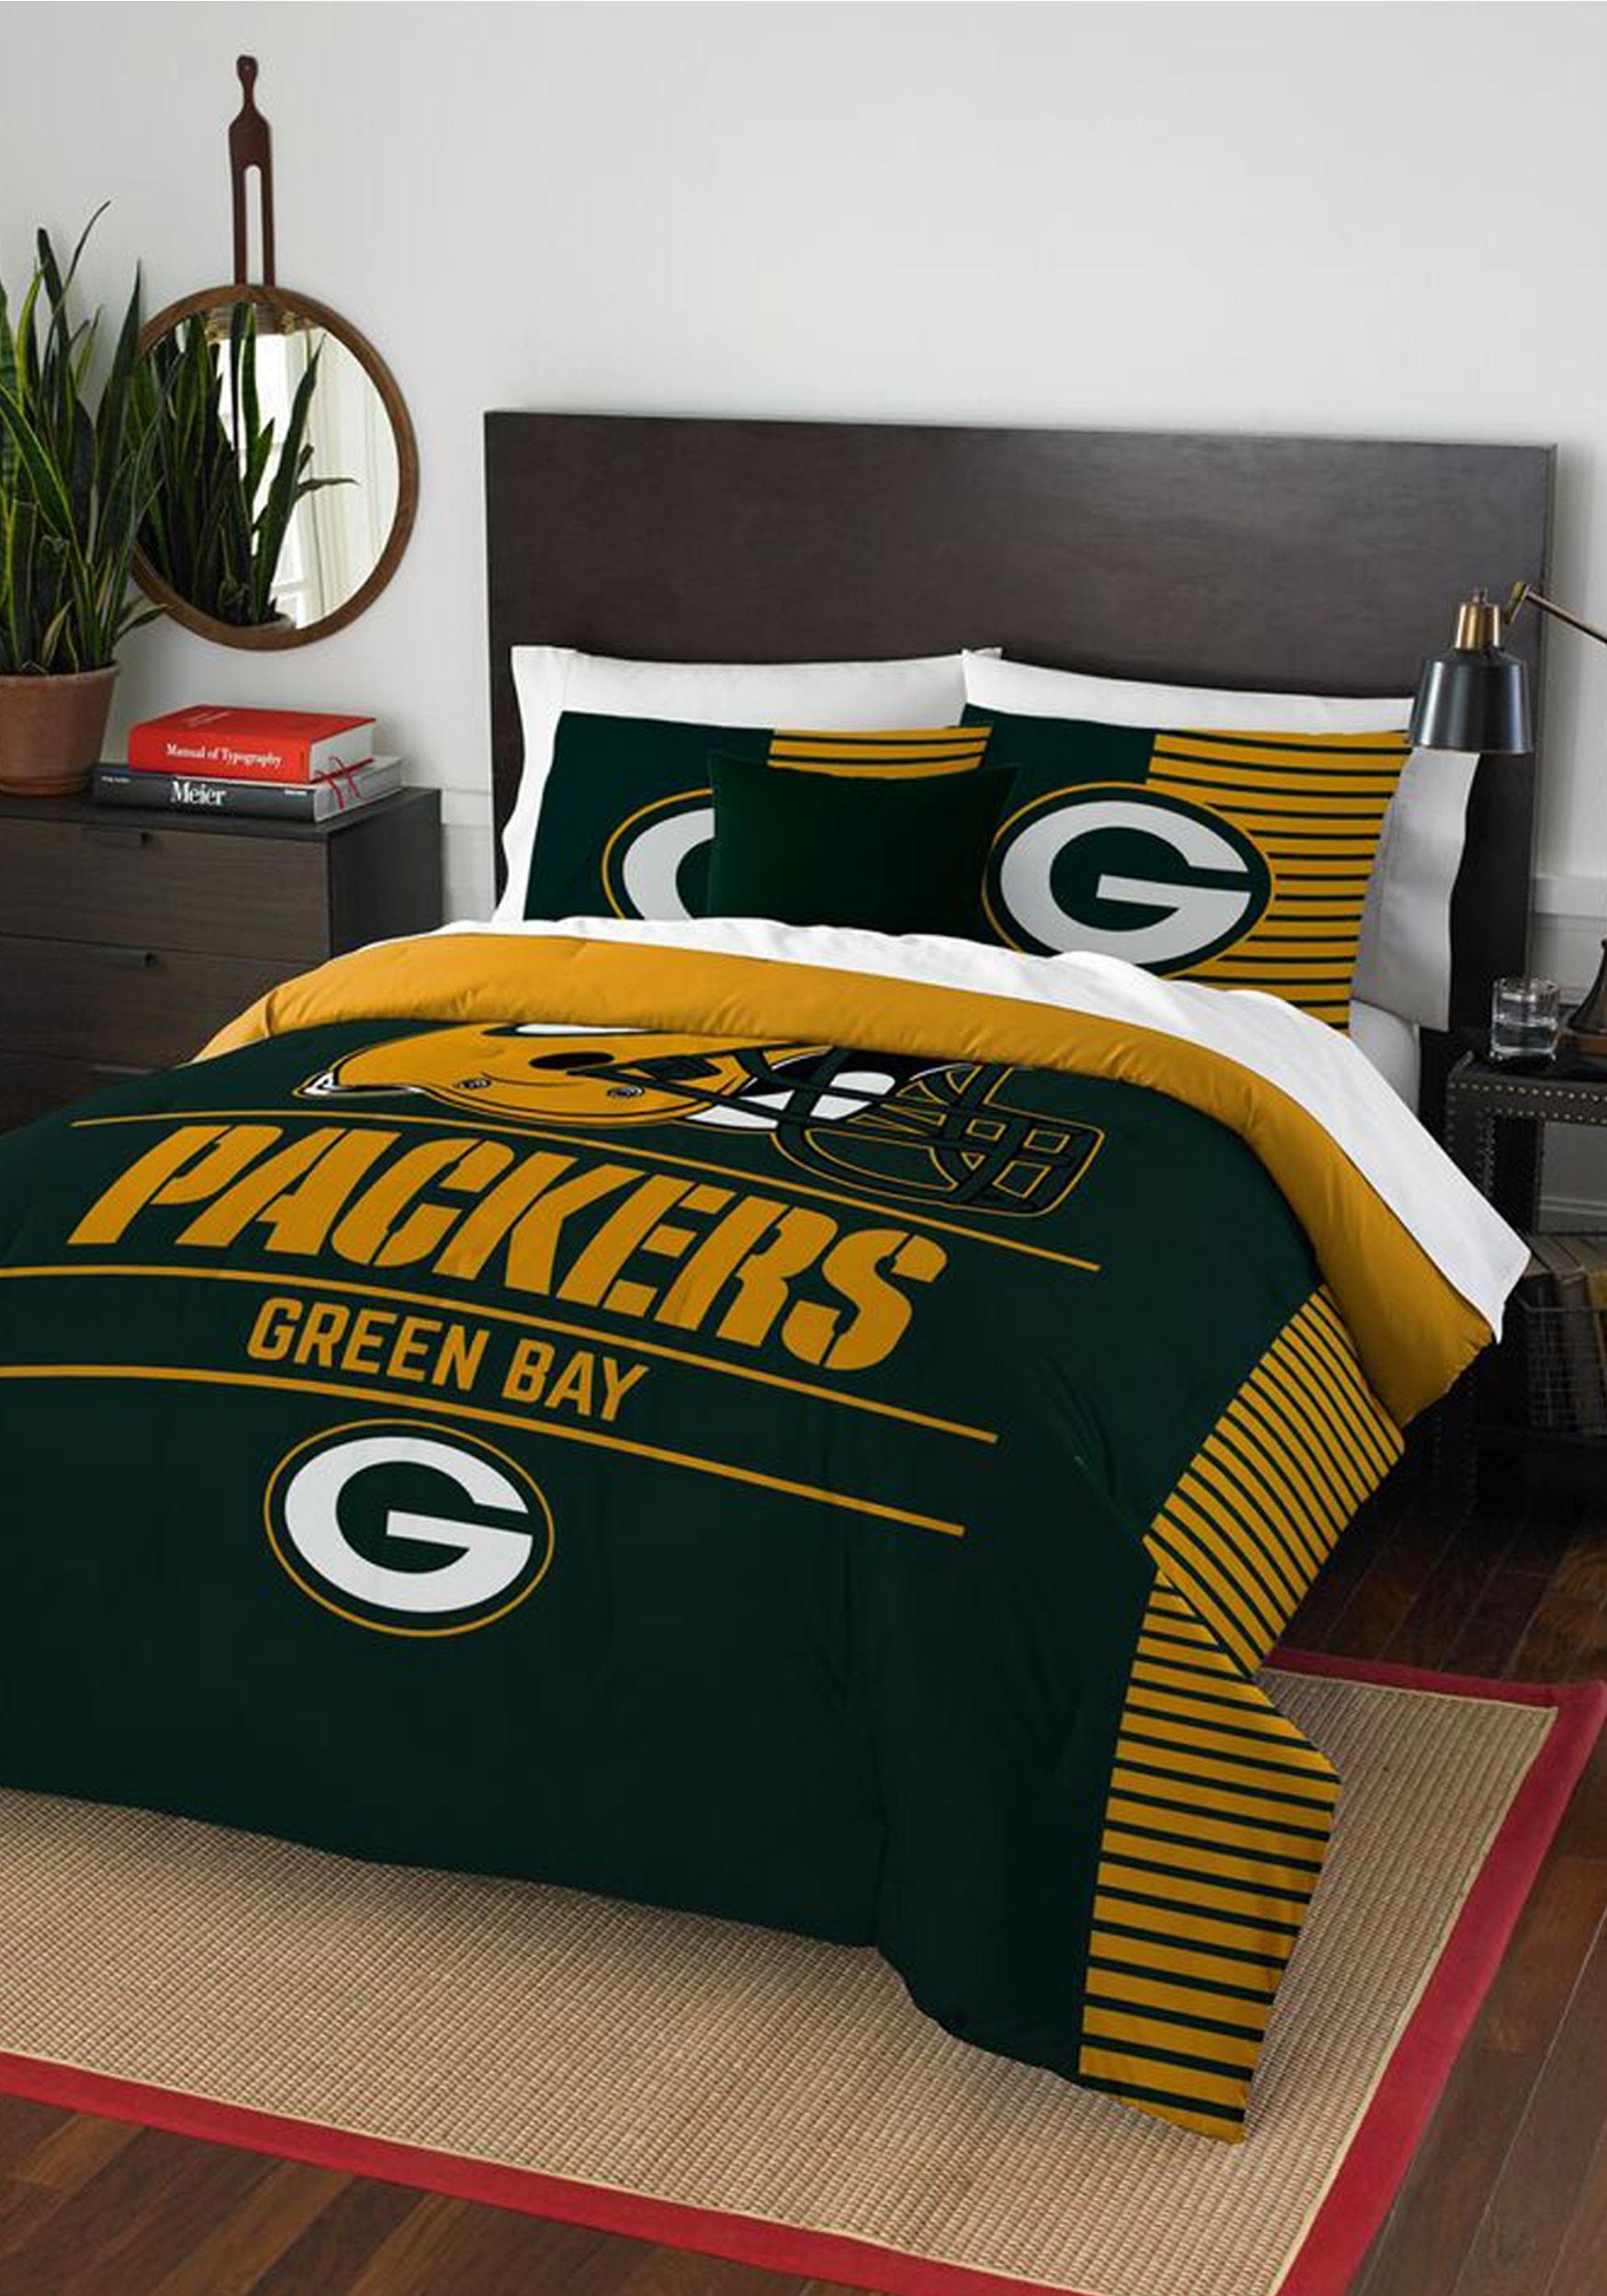 green bay packers full queen bedding